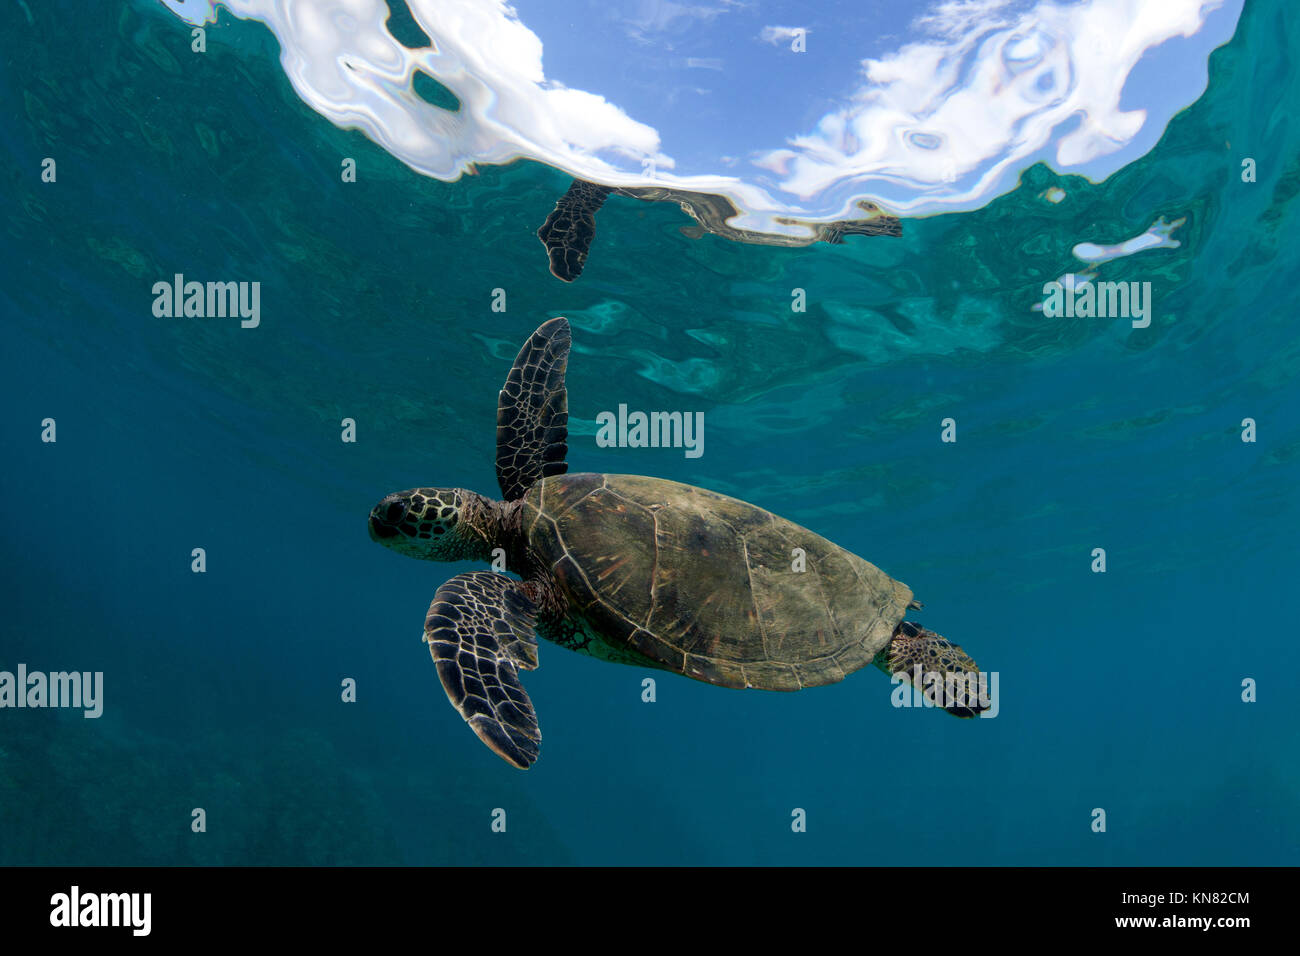 Tortuga de Mar Verde de Black Rock, Kaanapali, Maui, Hawaii. Imagen De Stock